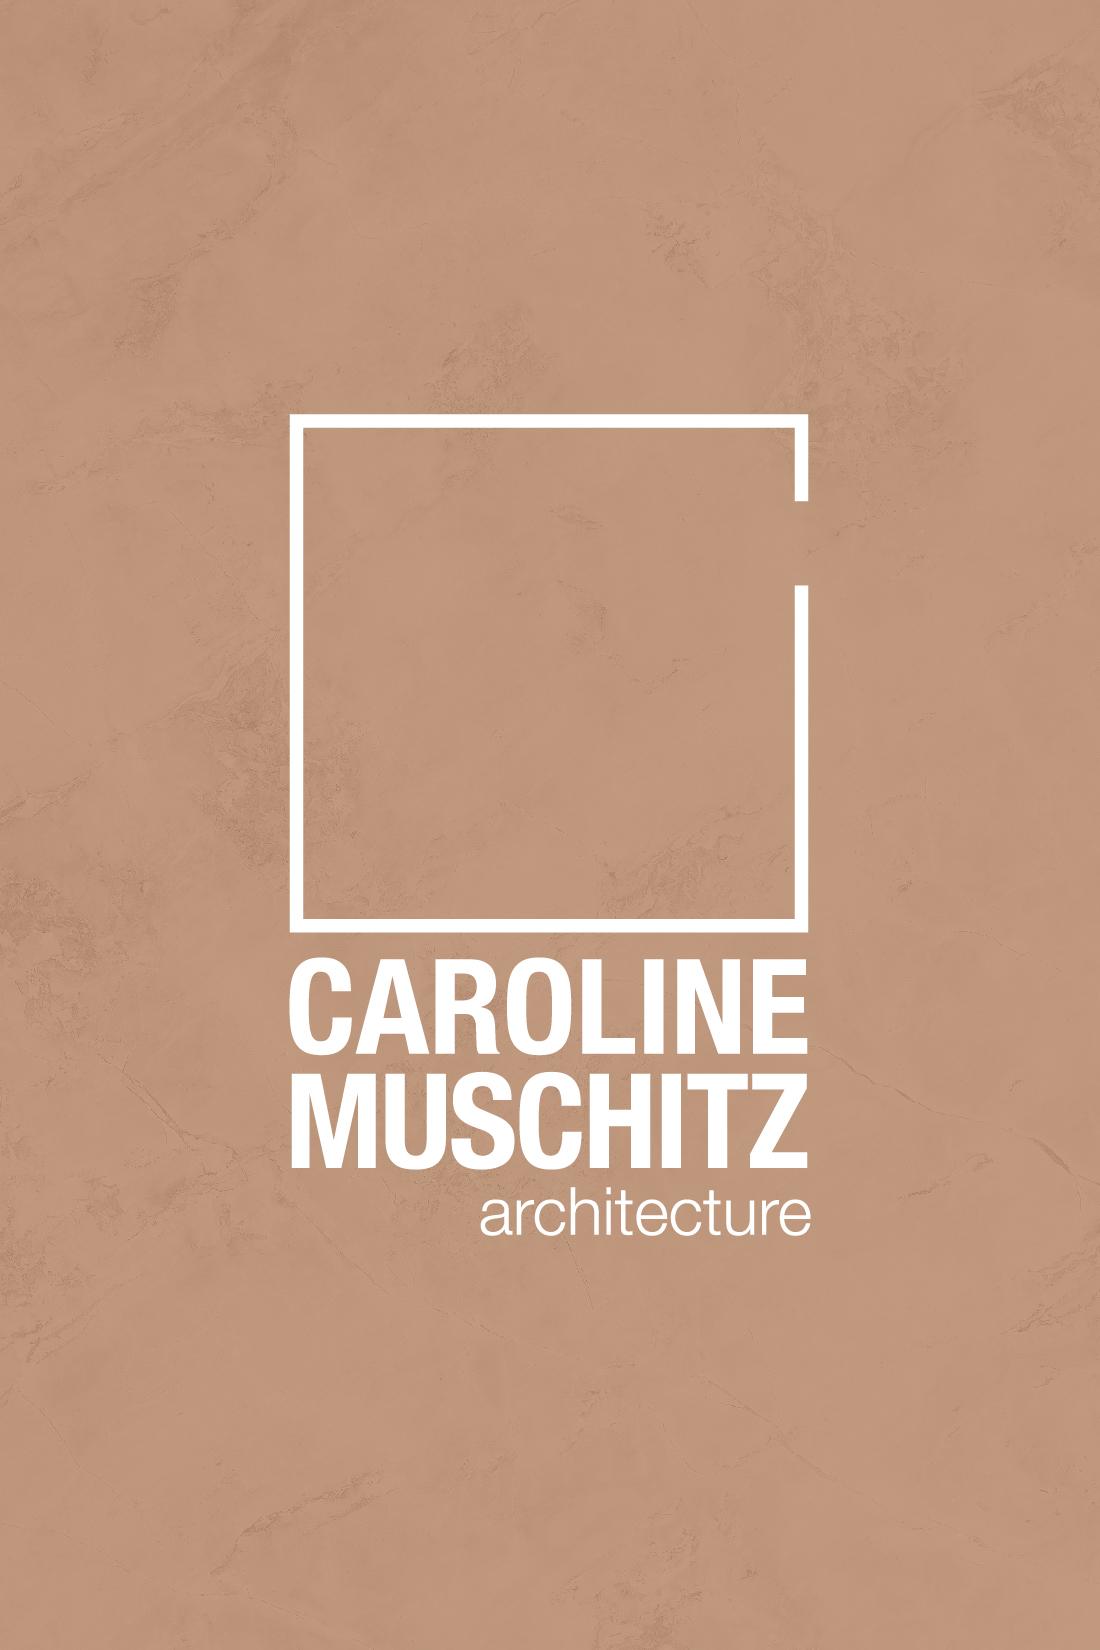 CAROLINE MUSCHITZ